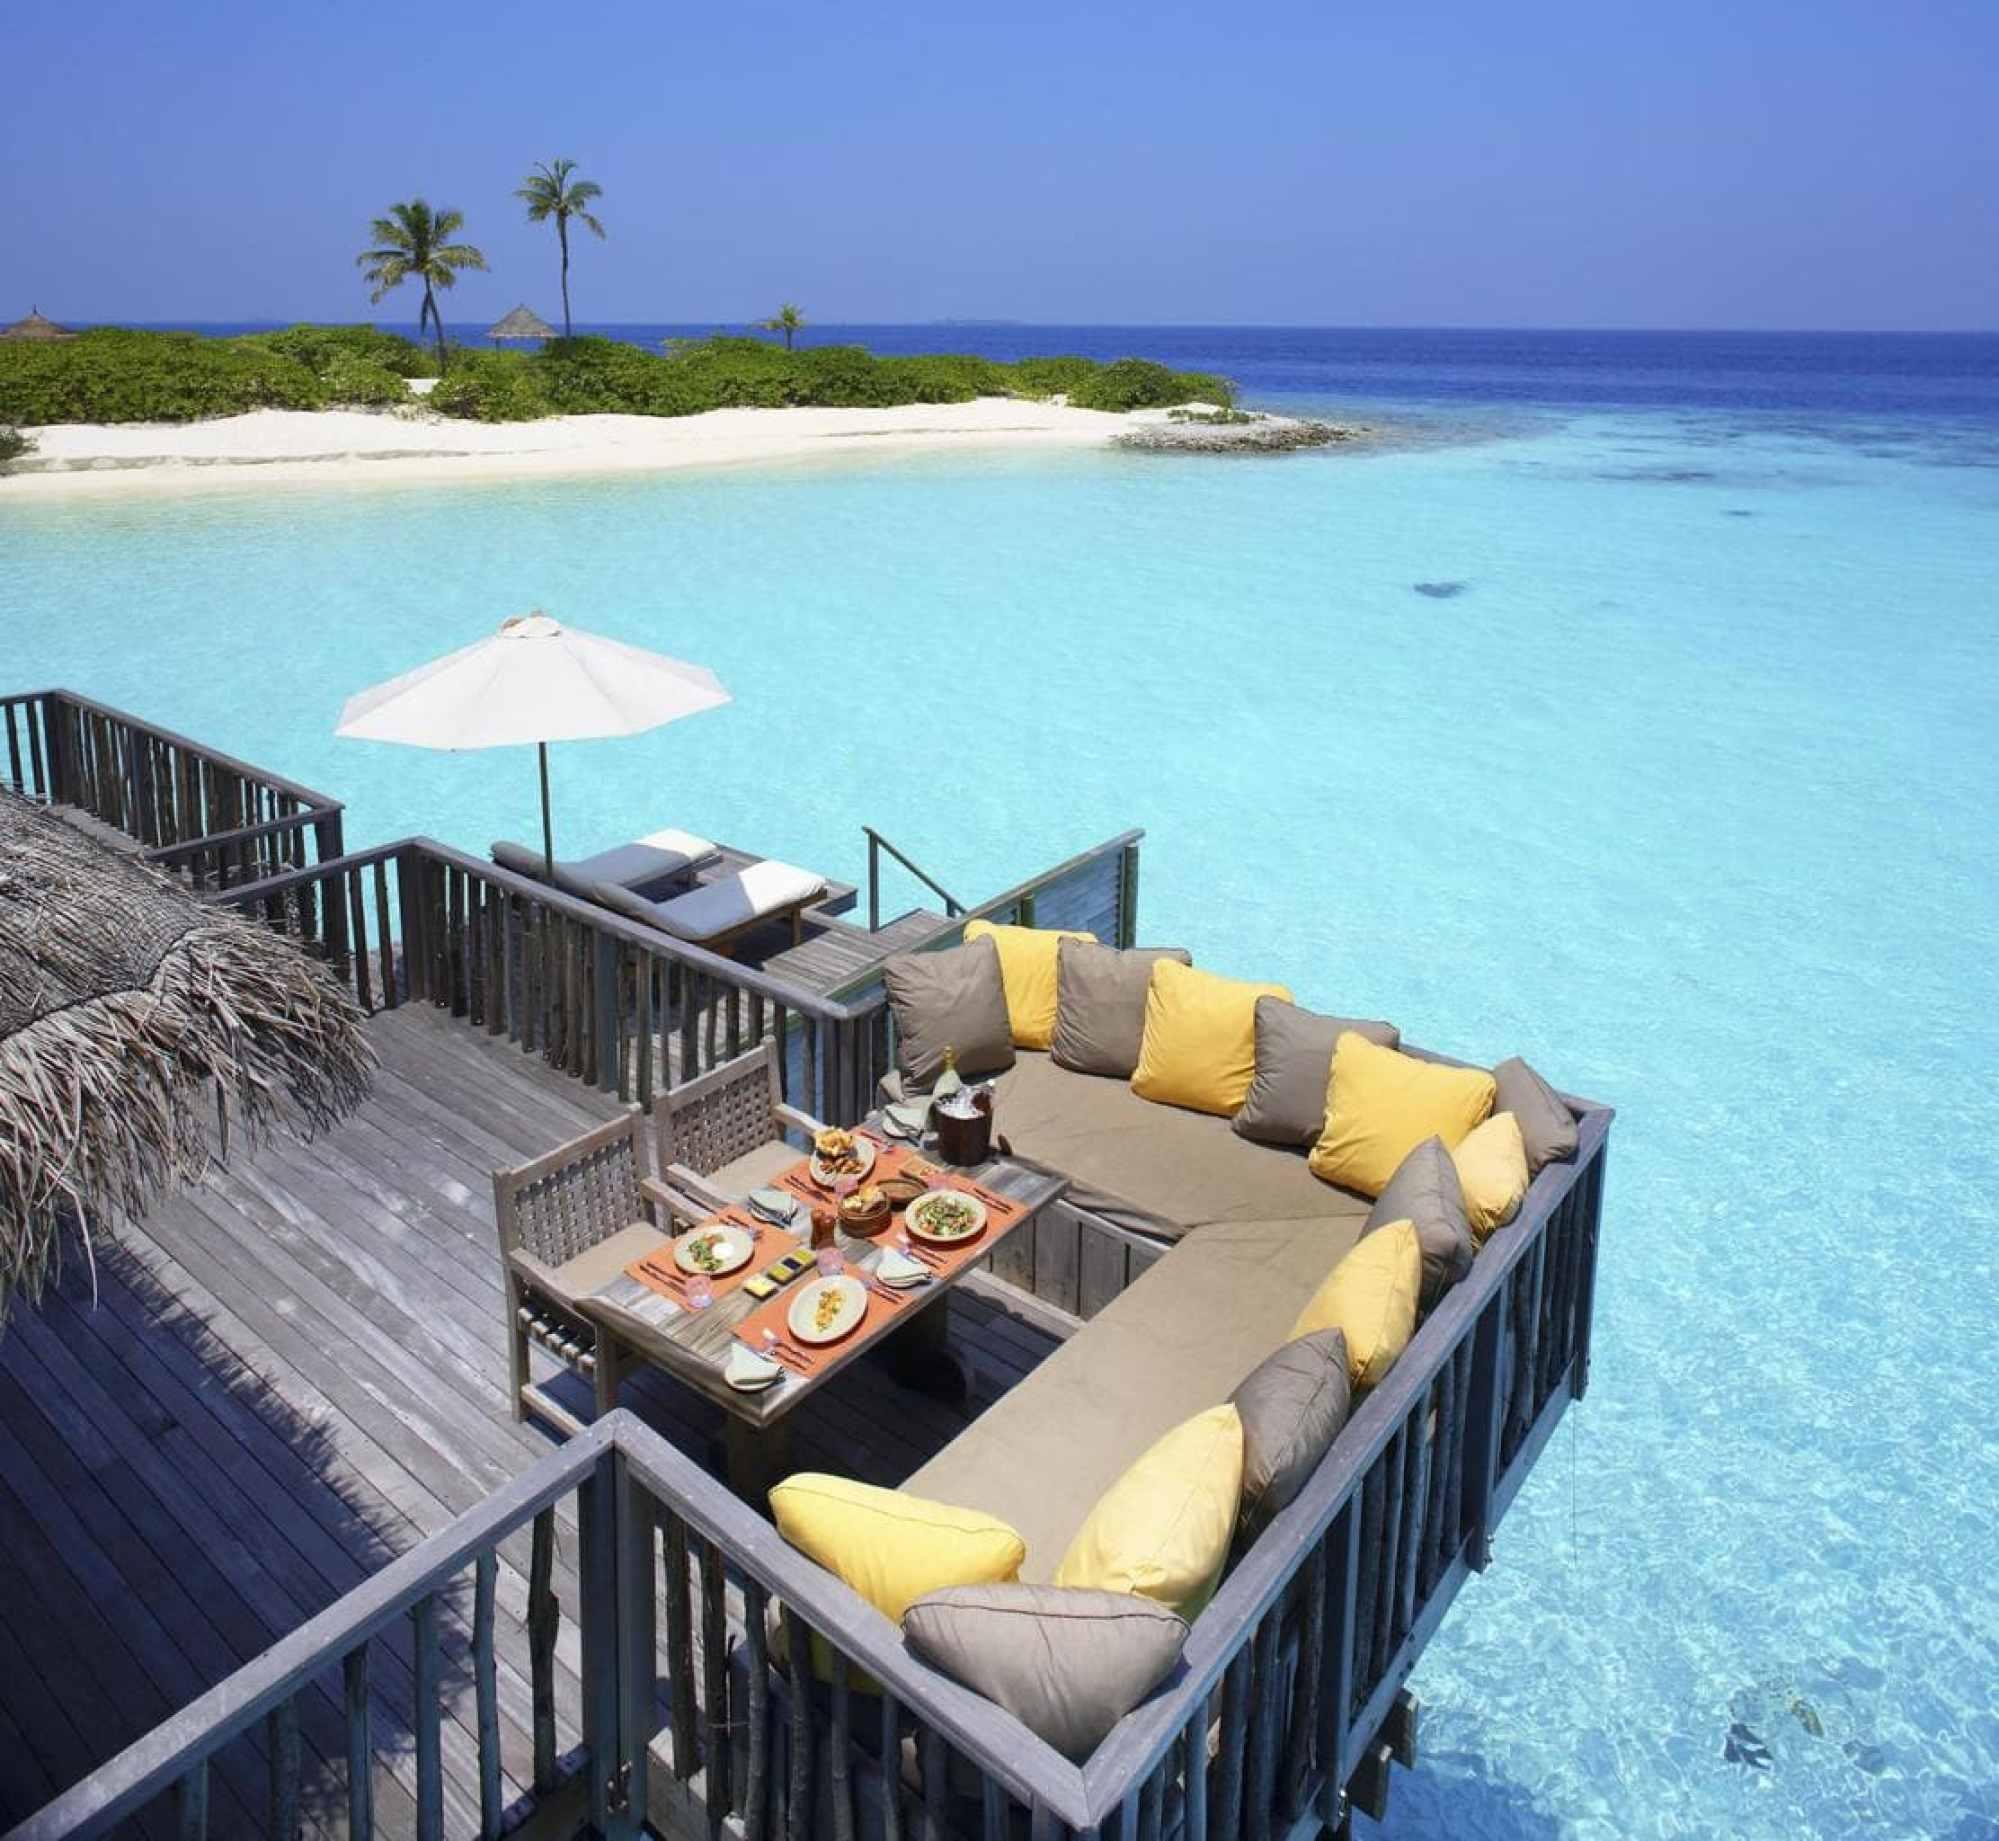 Family villa at Gili Lankanfushi - Courtesy of Gili Lankanfushi